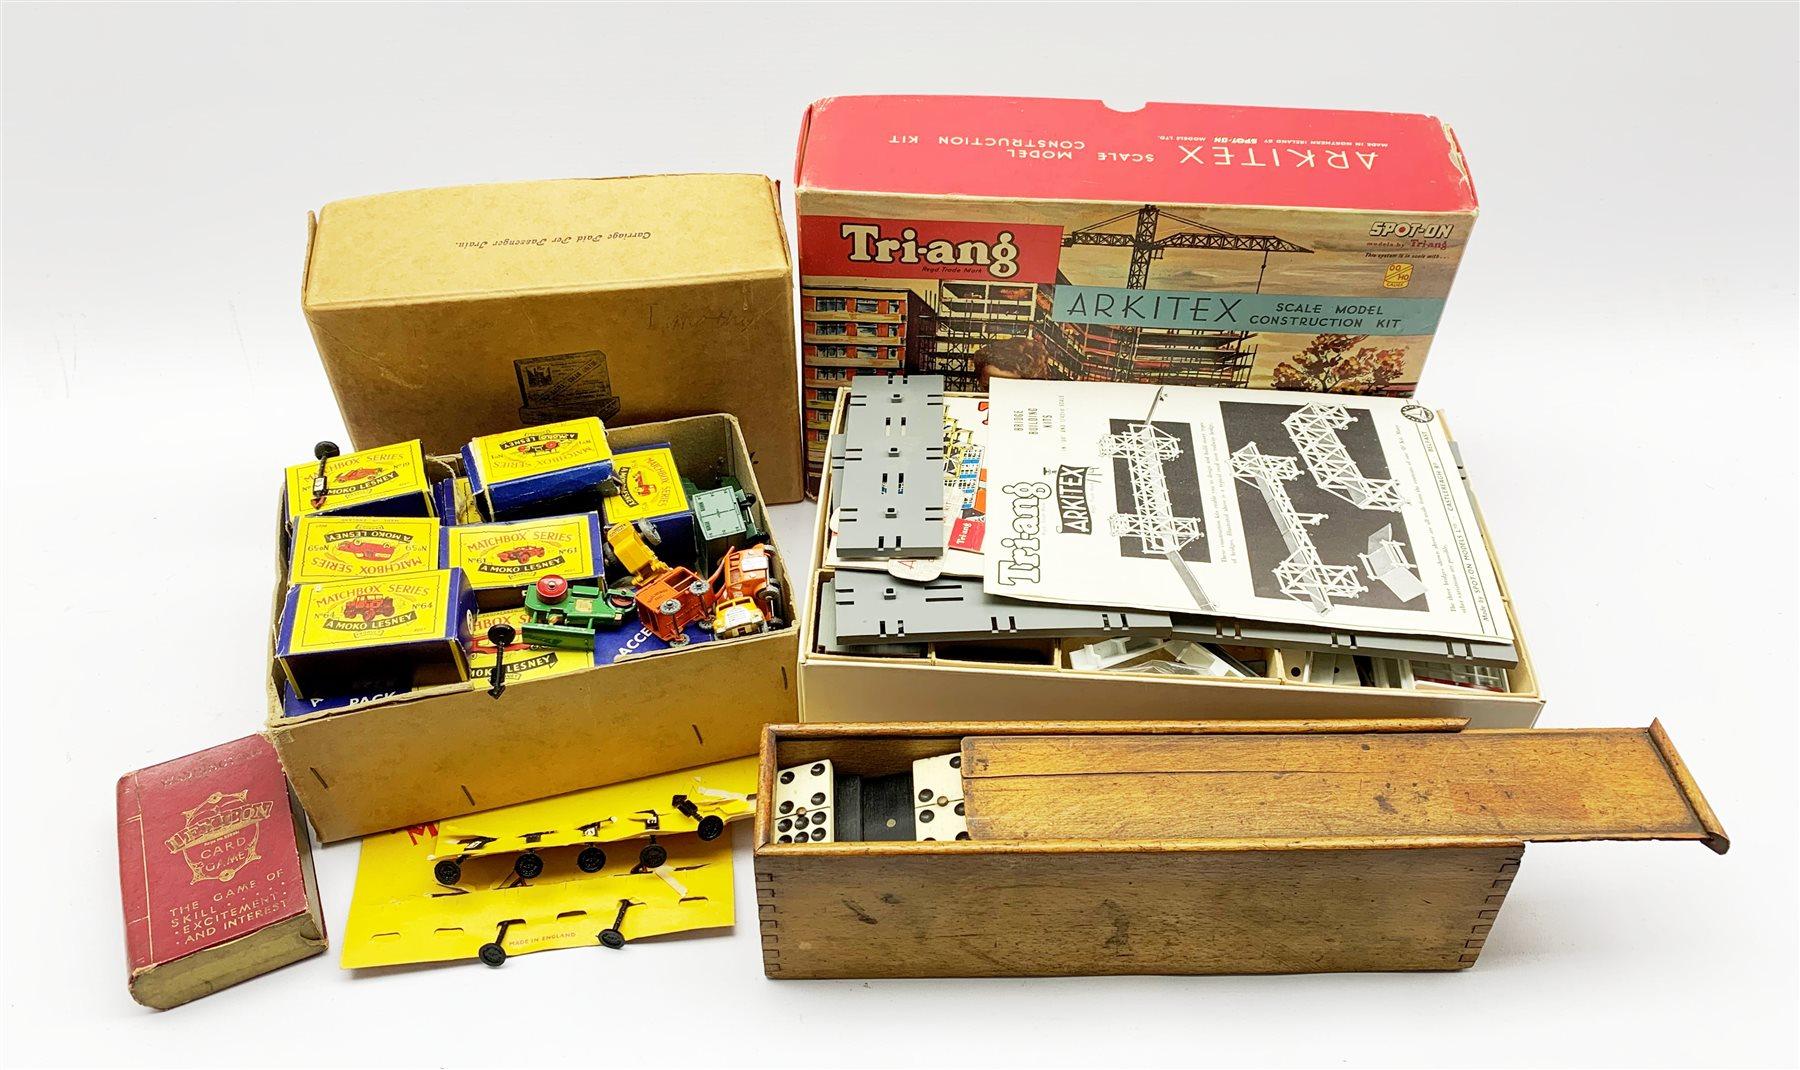 Triang Arkitex construction kit, Matchbox model vehicles, box of dominoes etc